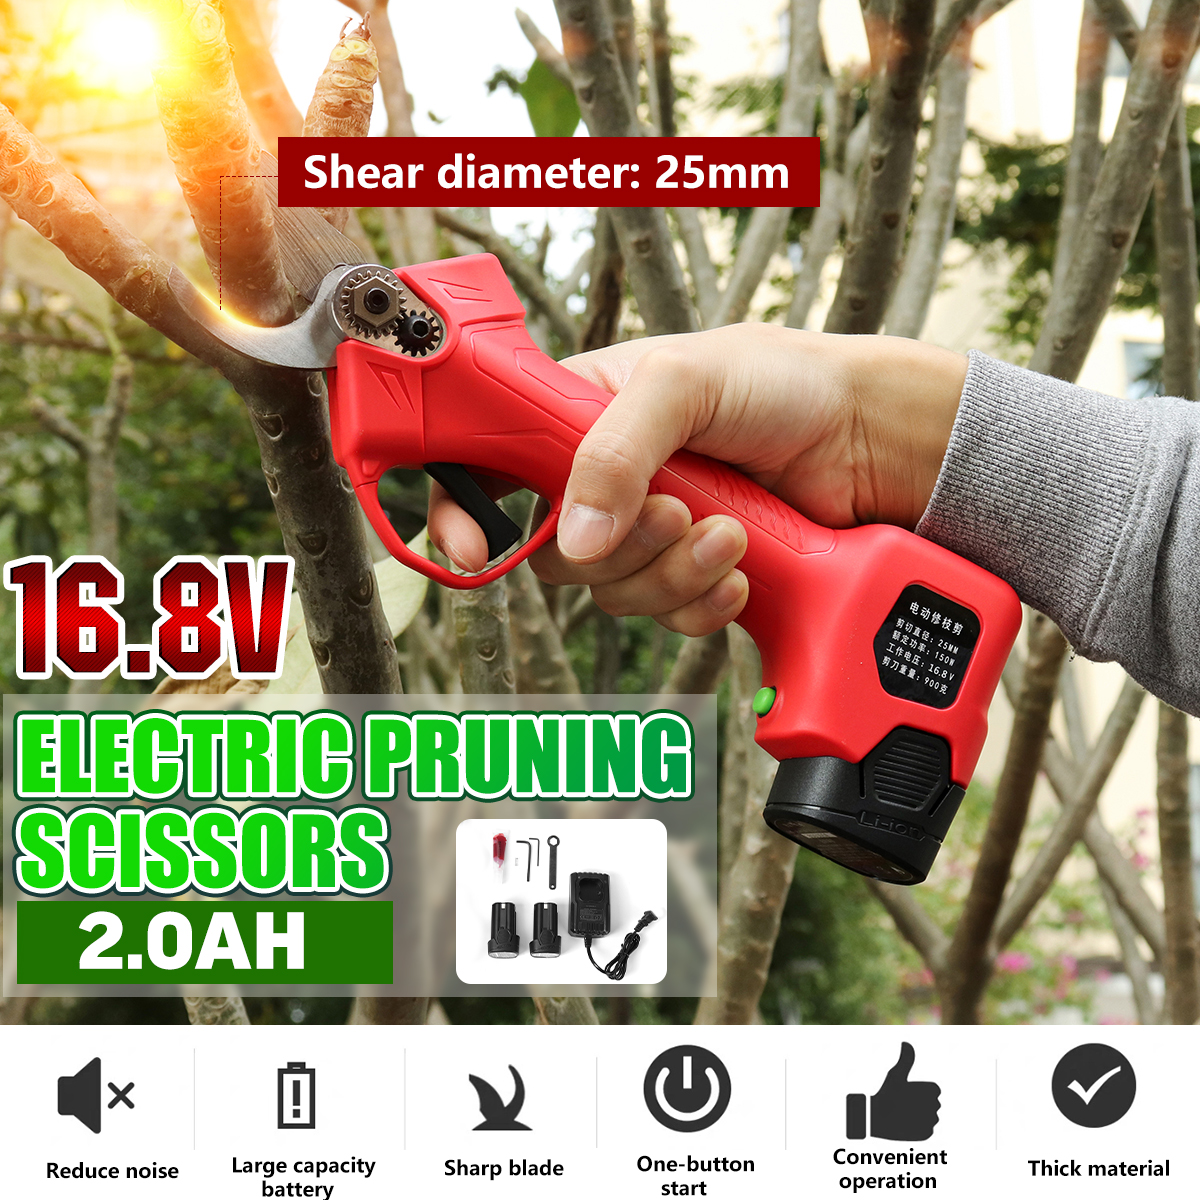 Doersupp W/2x Battery 16.8V 45mm Wireless Electric Rechargeable Scissors Pruning Scissors Branch Cutter Shears Tree Garden Tool